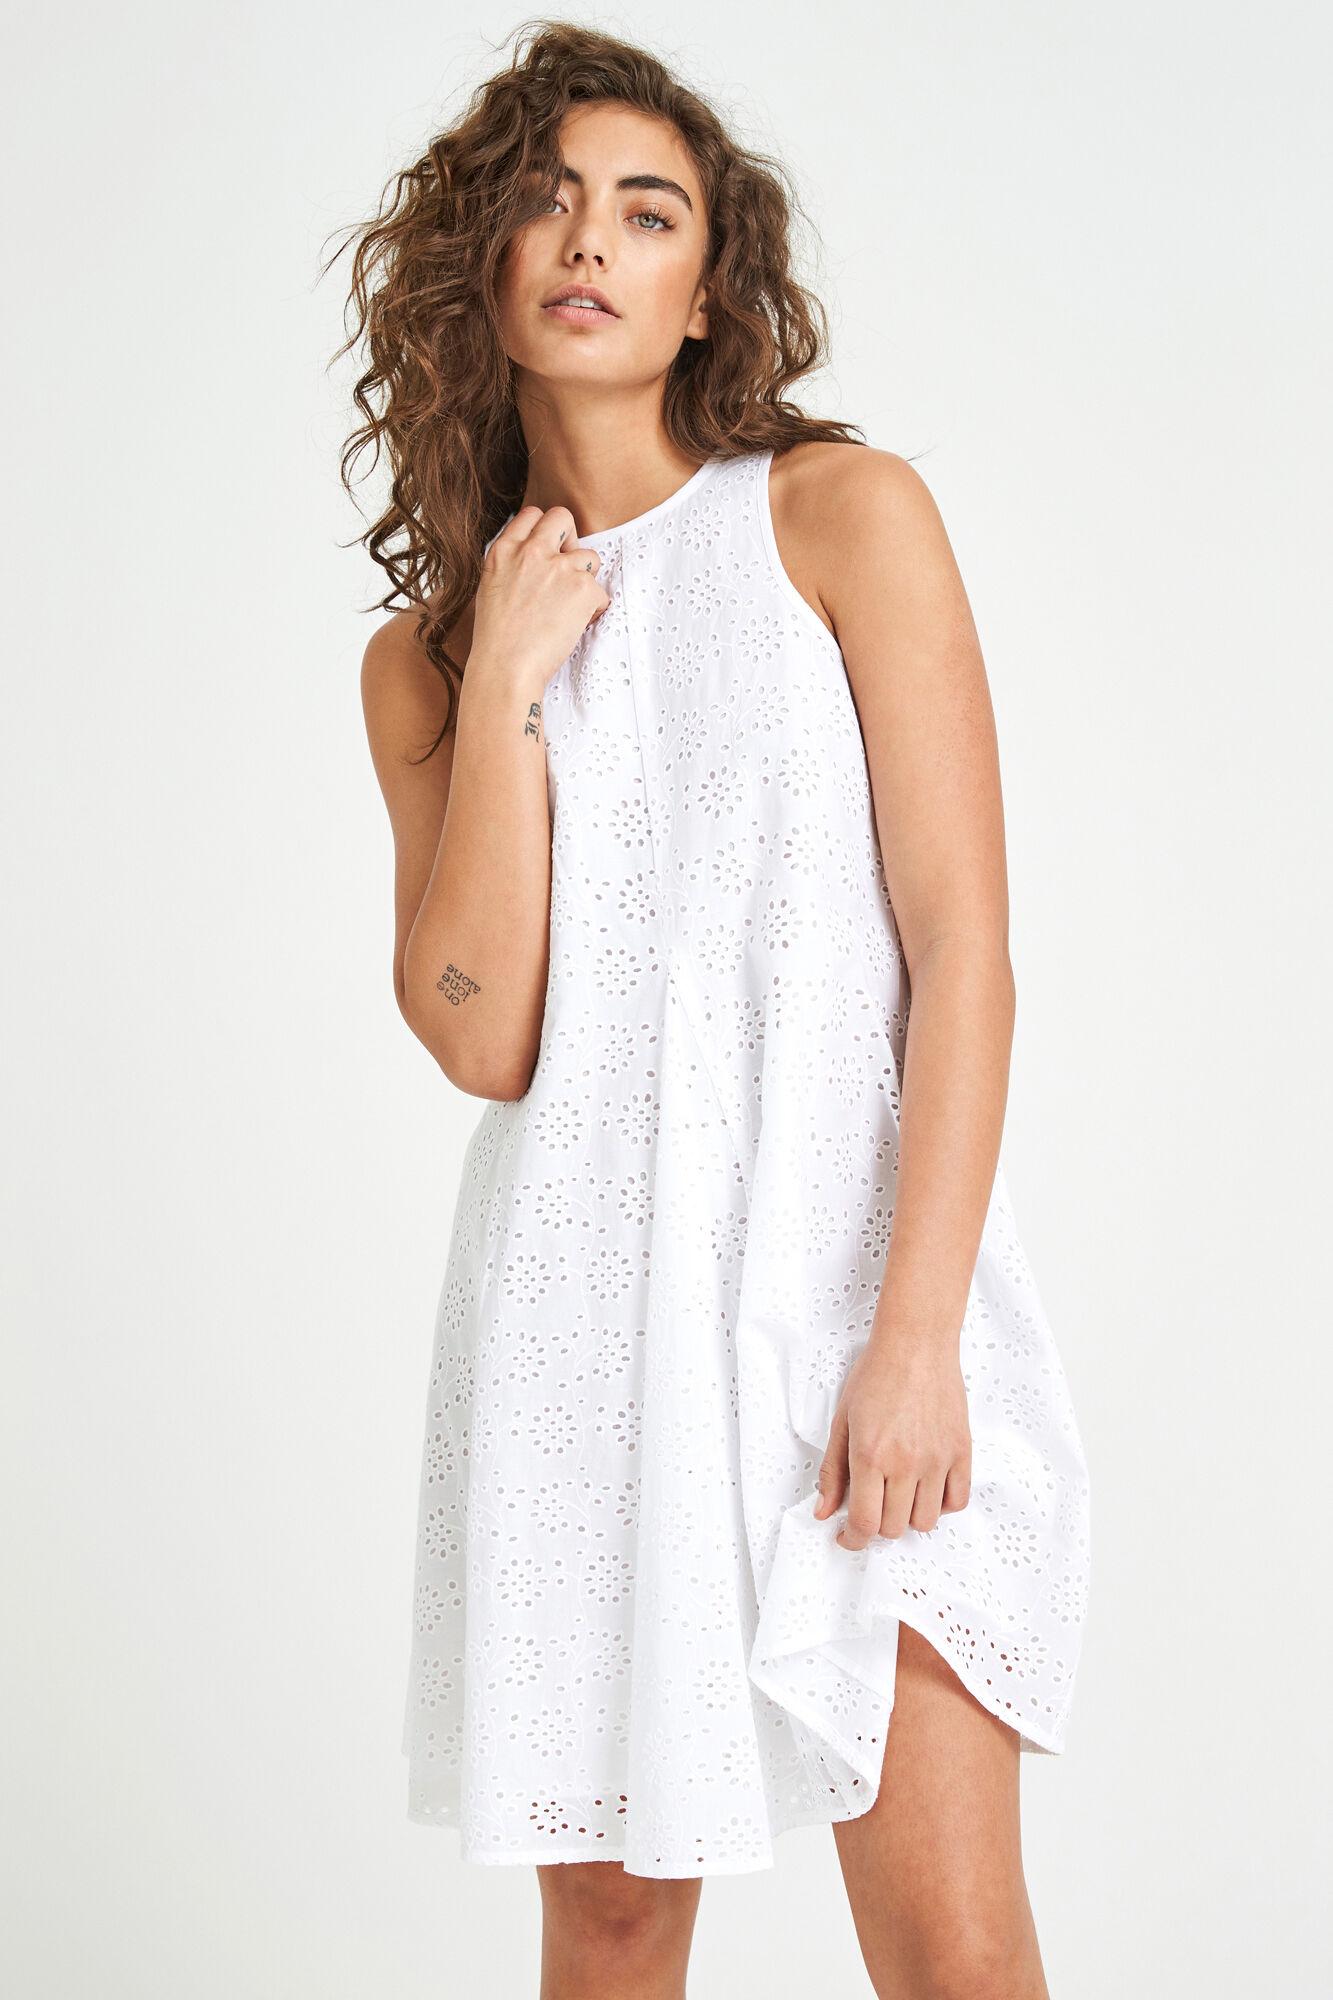 ENTRACY SL DRESS 6732